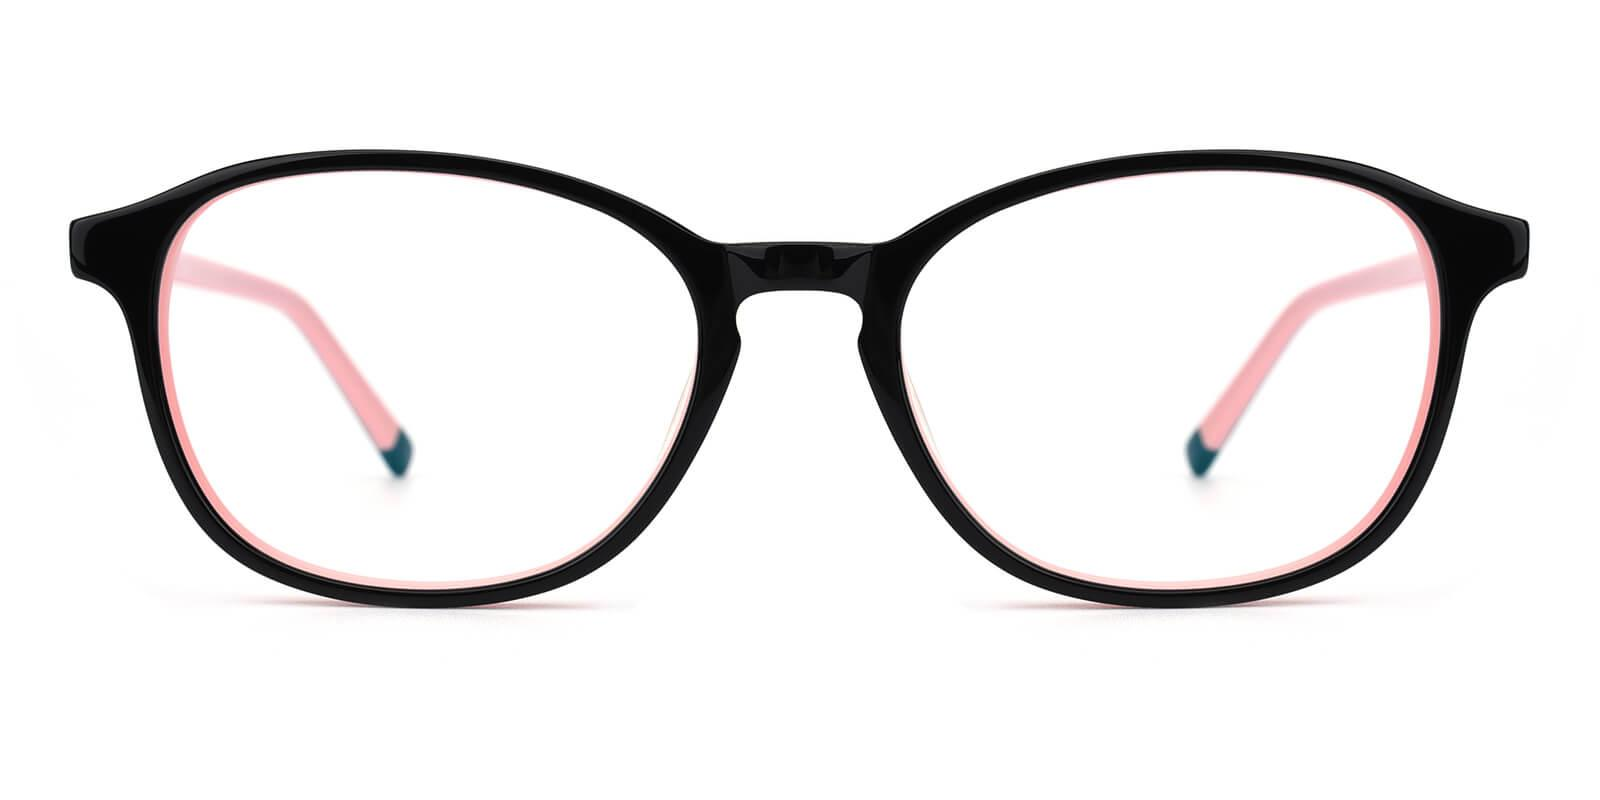 Lisbon-Pink-Square-Acetate-Eyeglasses-additional2